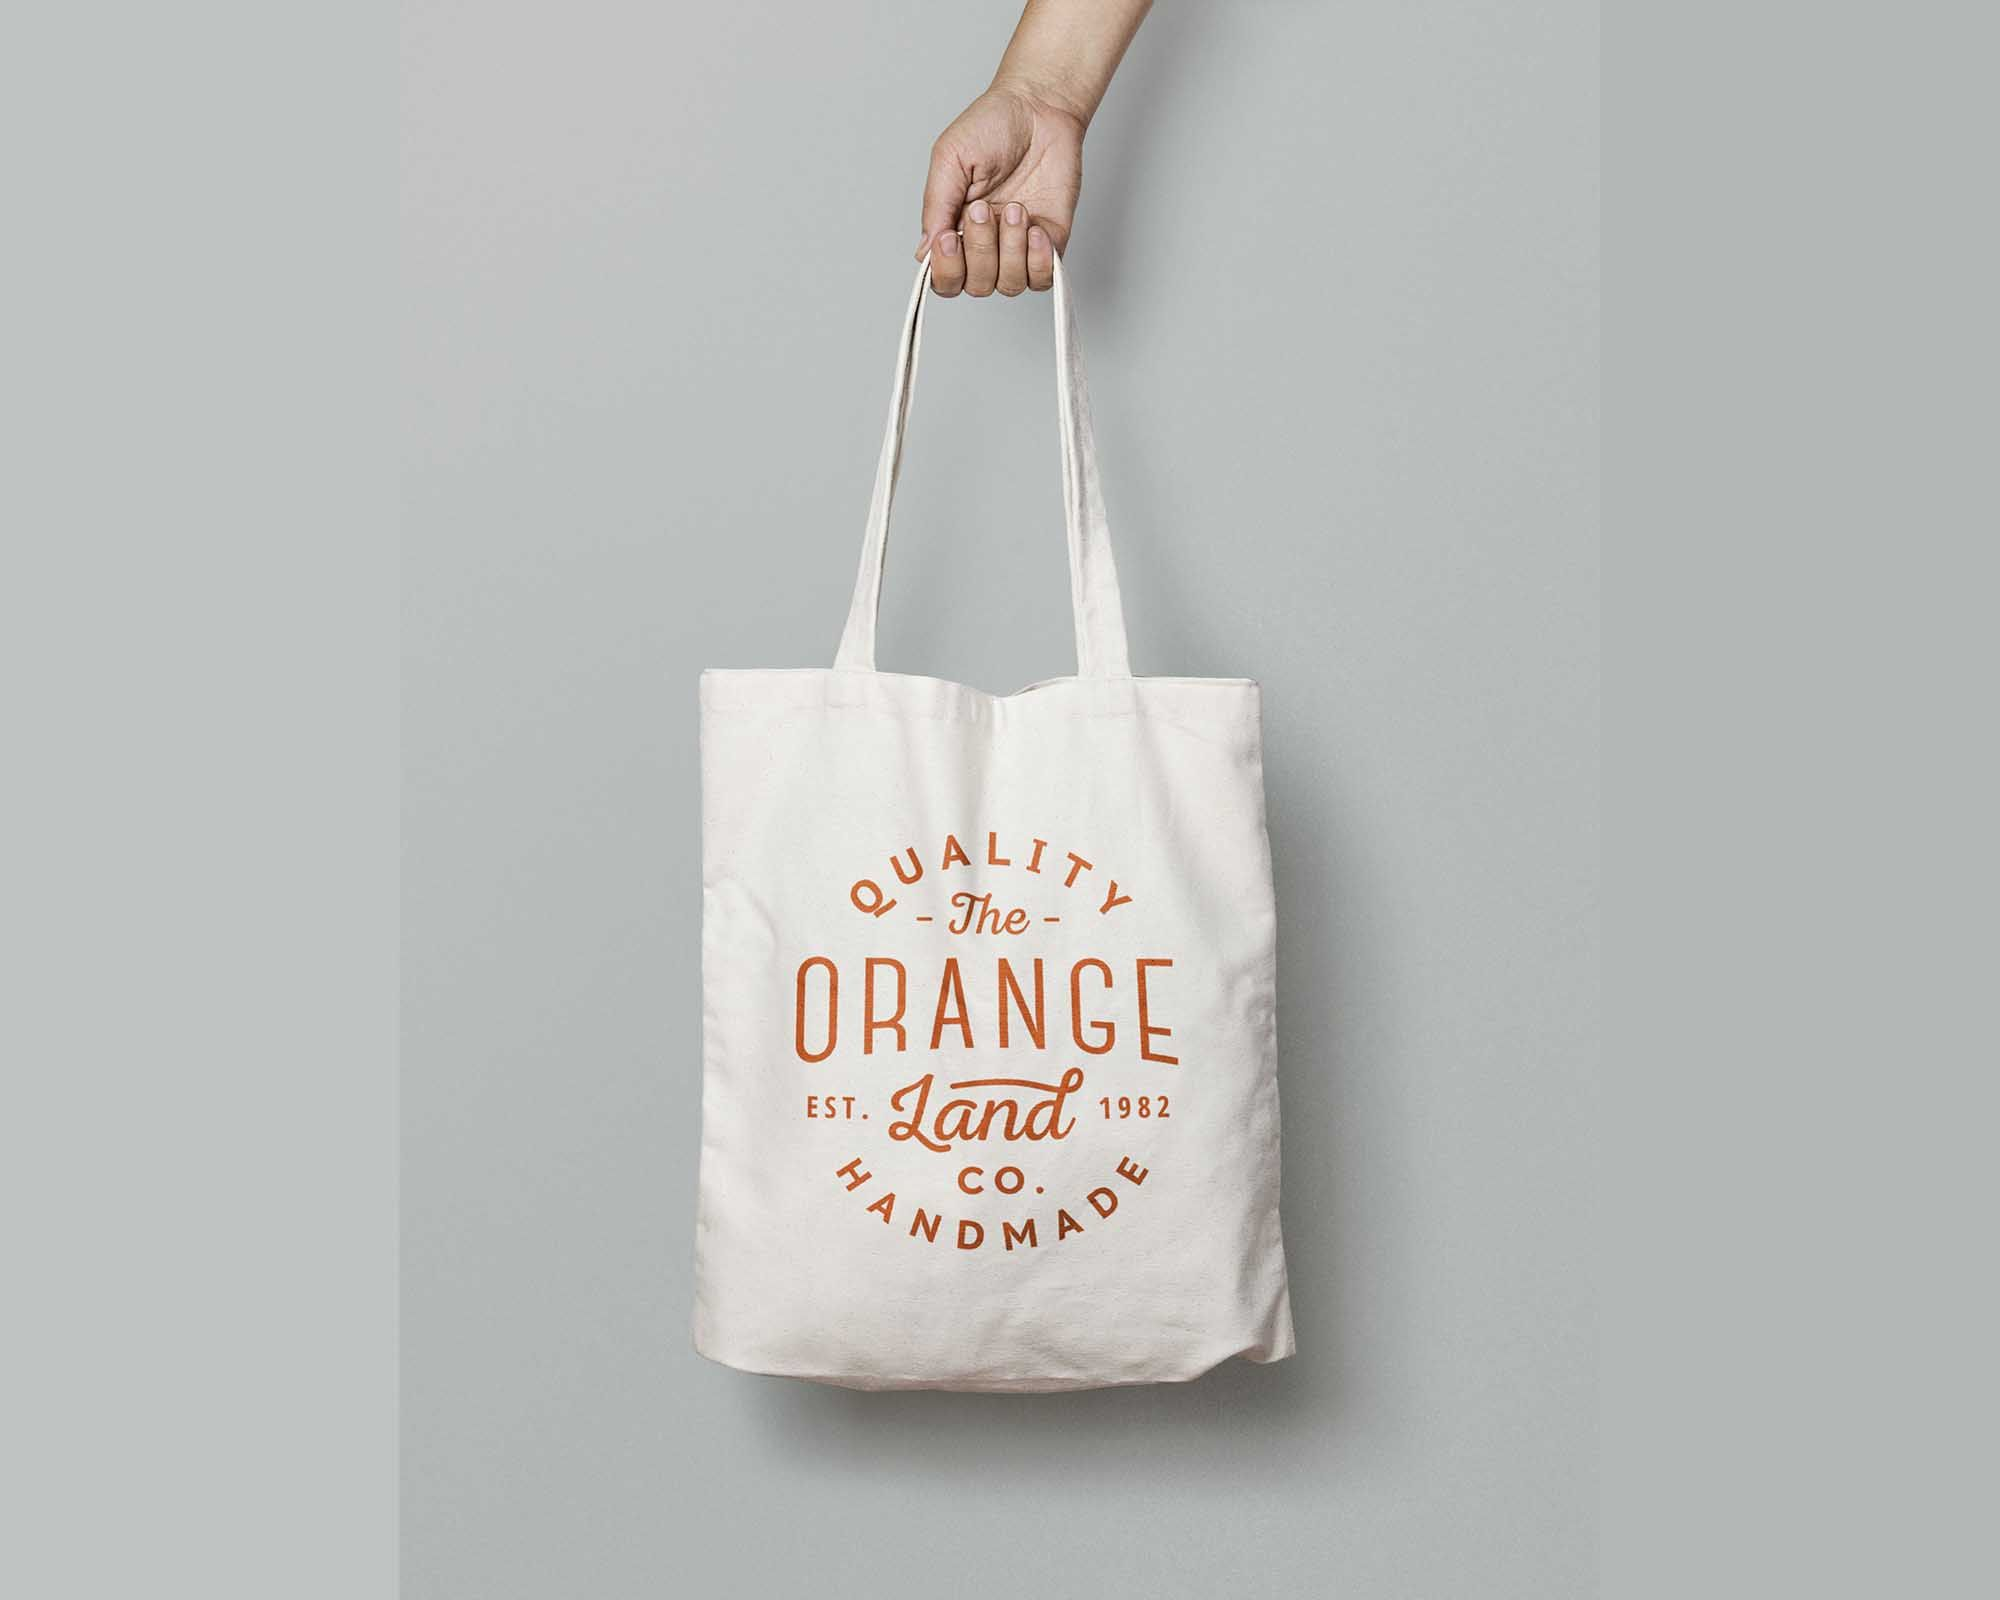 Download Tote Bags Template For Design Google Search Bag Mockup Packaging Mockup Tote Bag